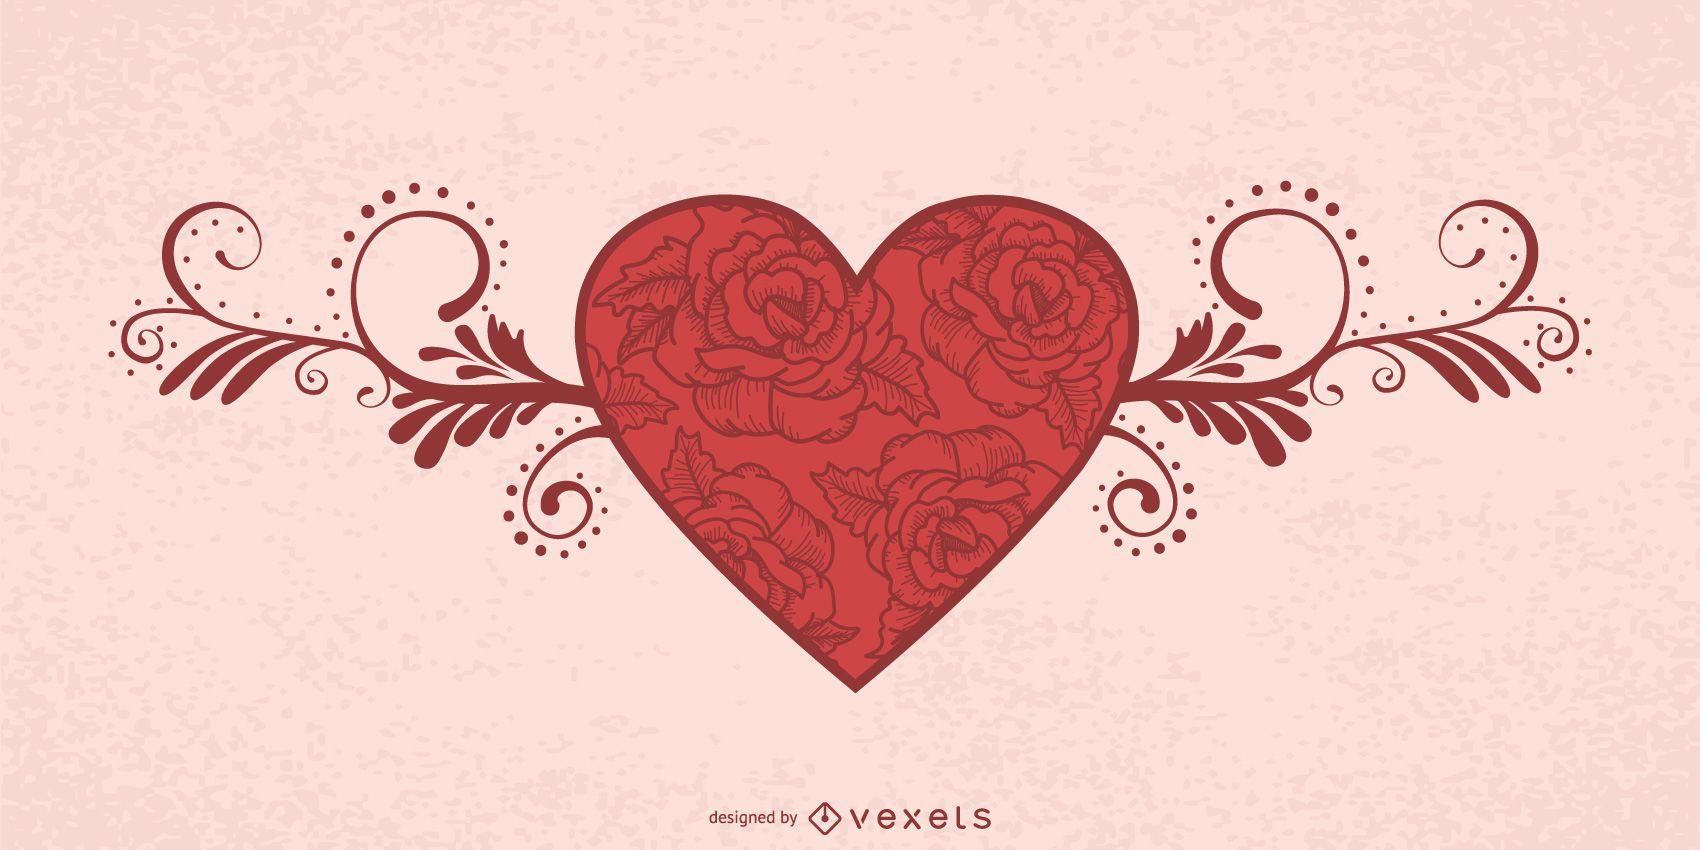 Decorative Floral Heart Valentine Card